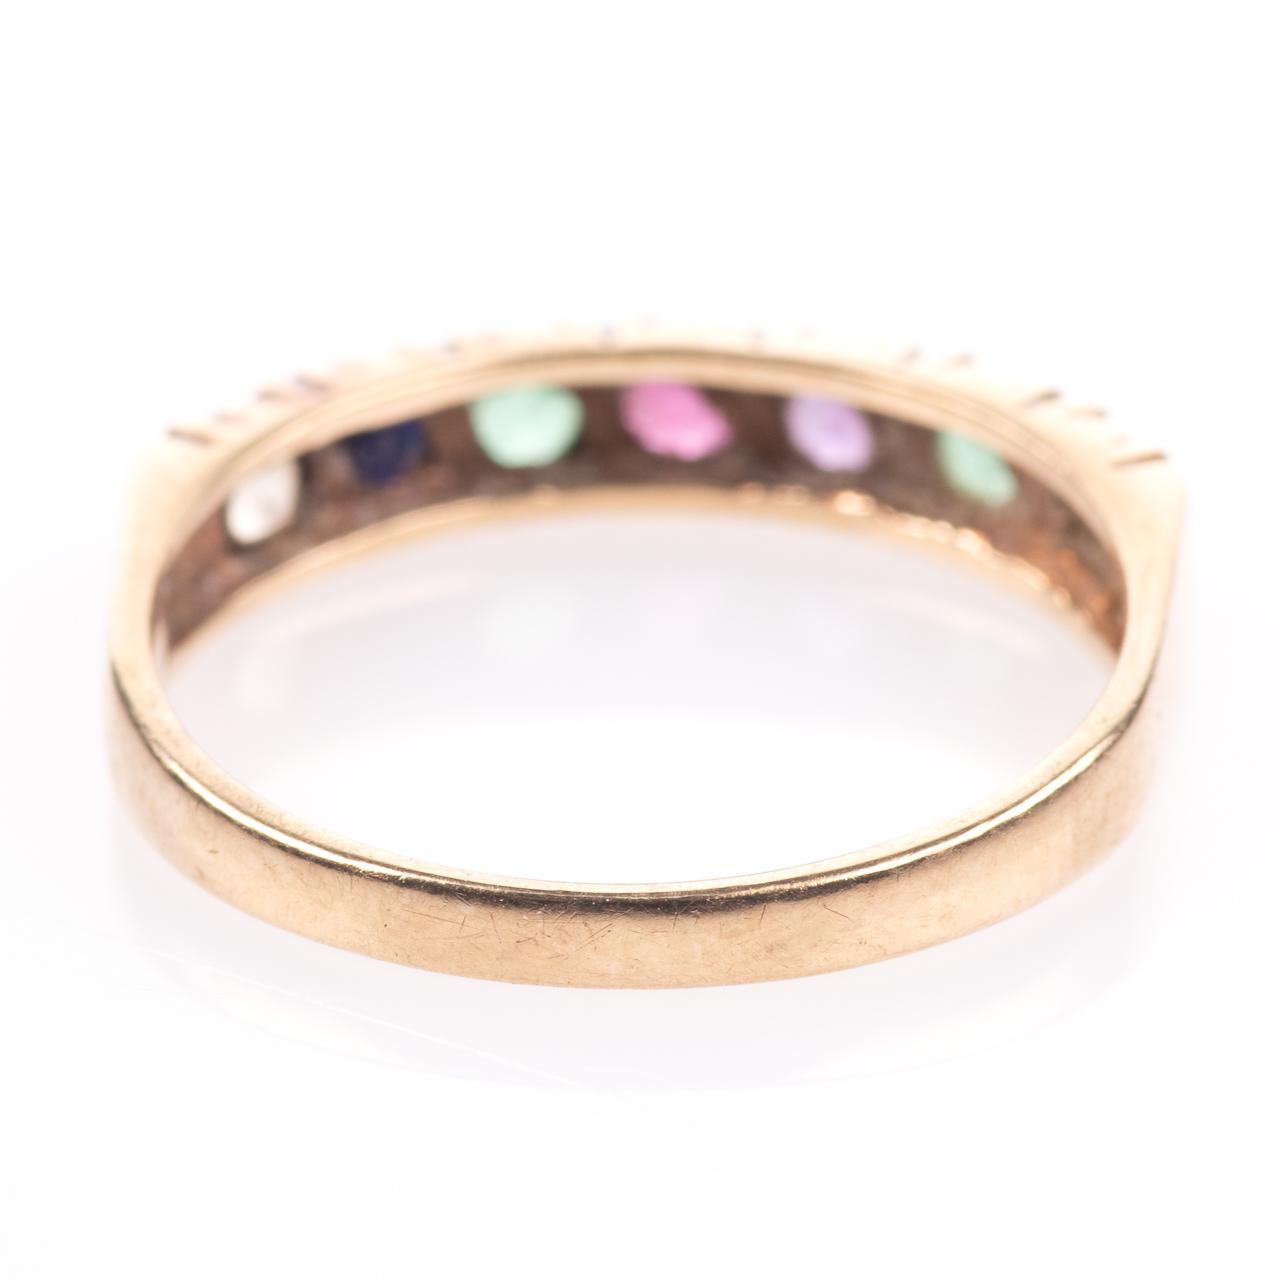 9ct Gold Emerald, Ruby, Amethyst, Sapphire & Diamond Ring - Image 6 of 8